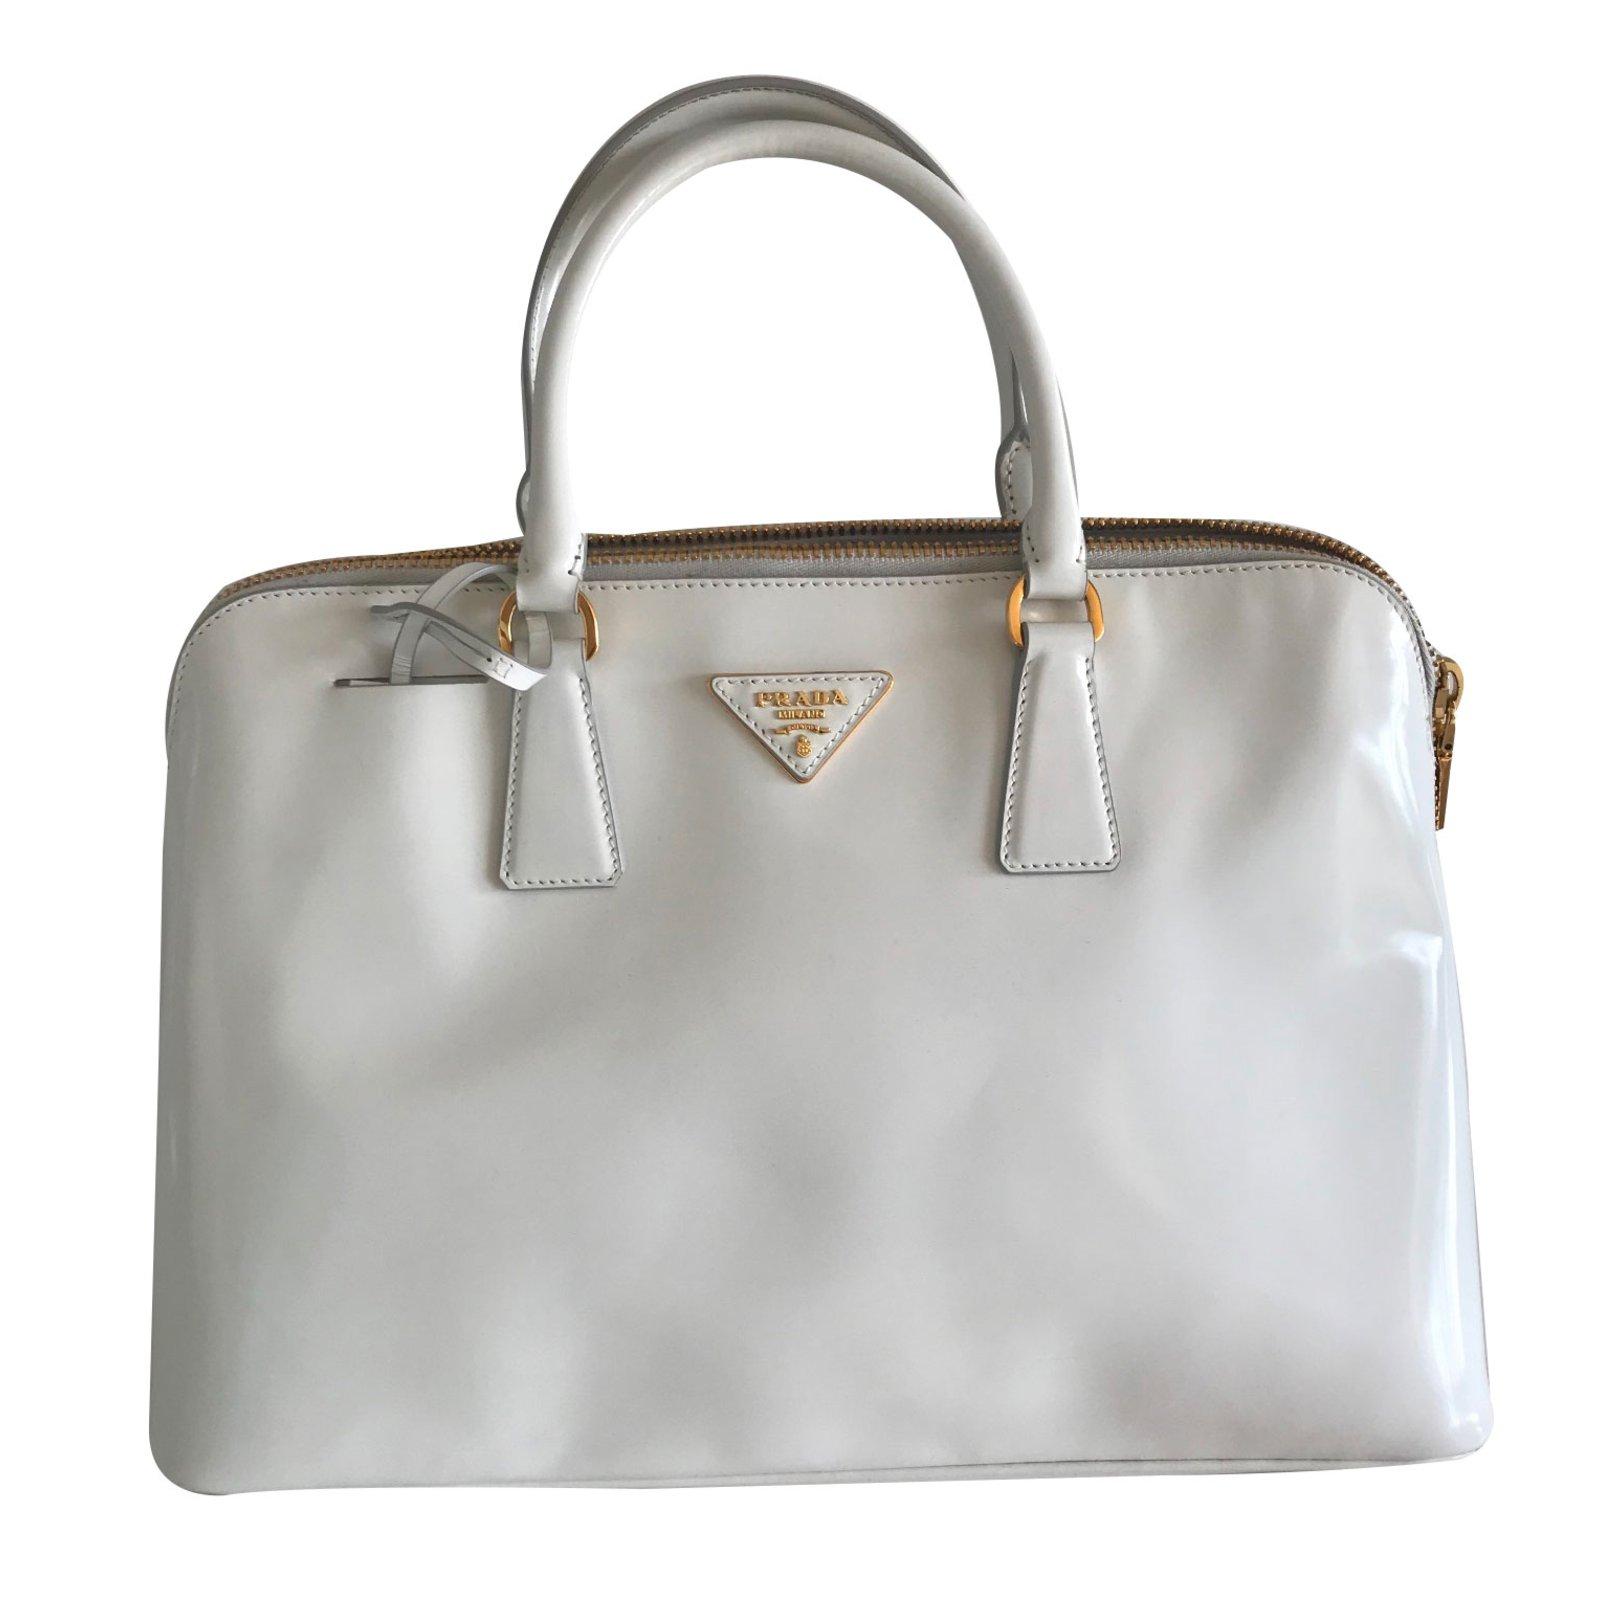 Prada Handbags Patent Leather White Ref 66868